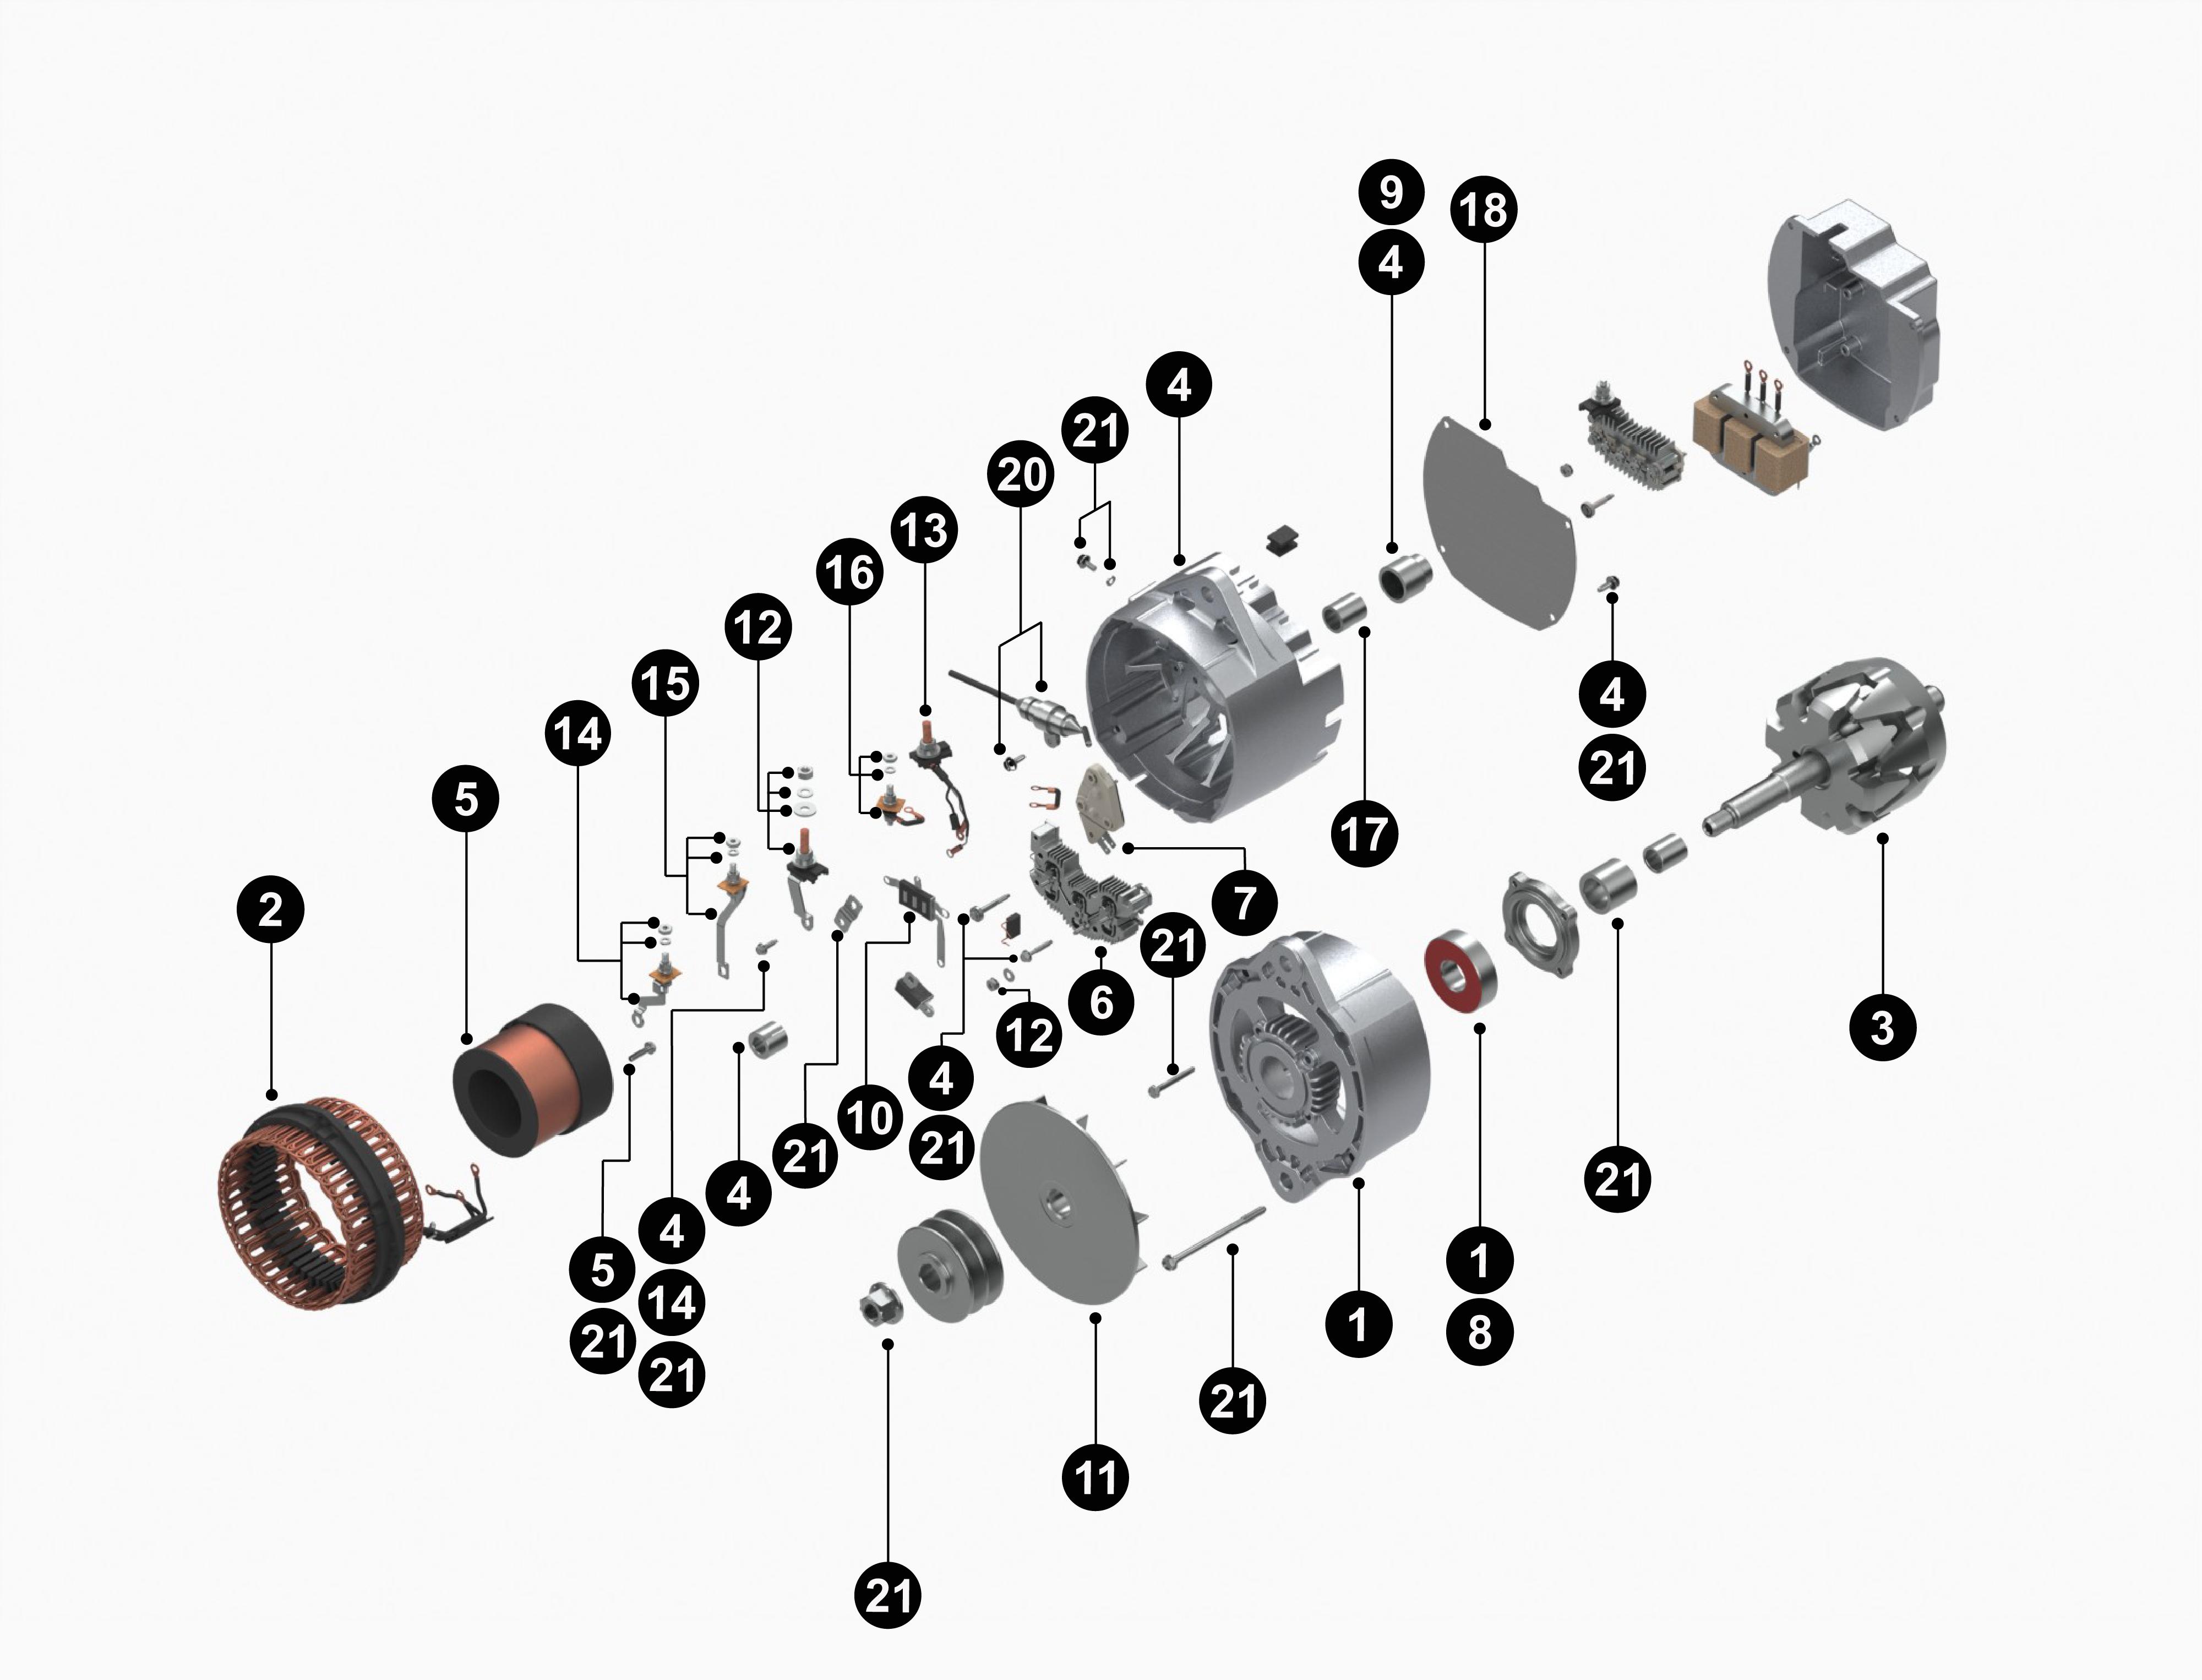 10459184 34SI Reman Alternator service parts